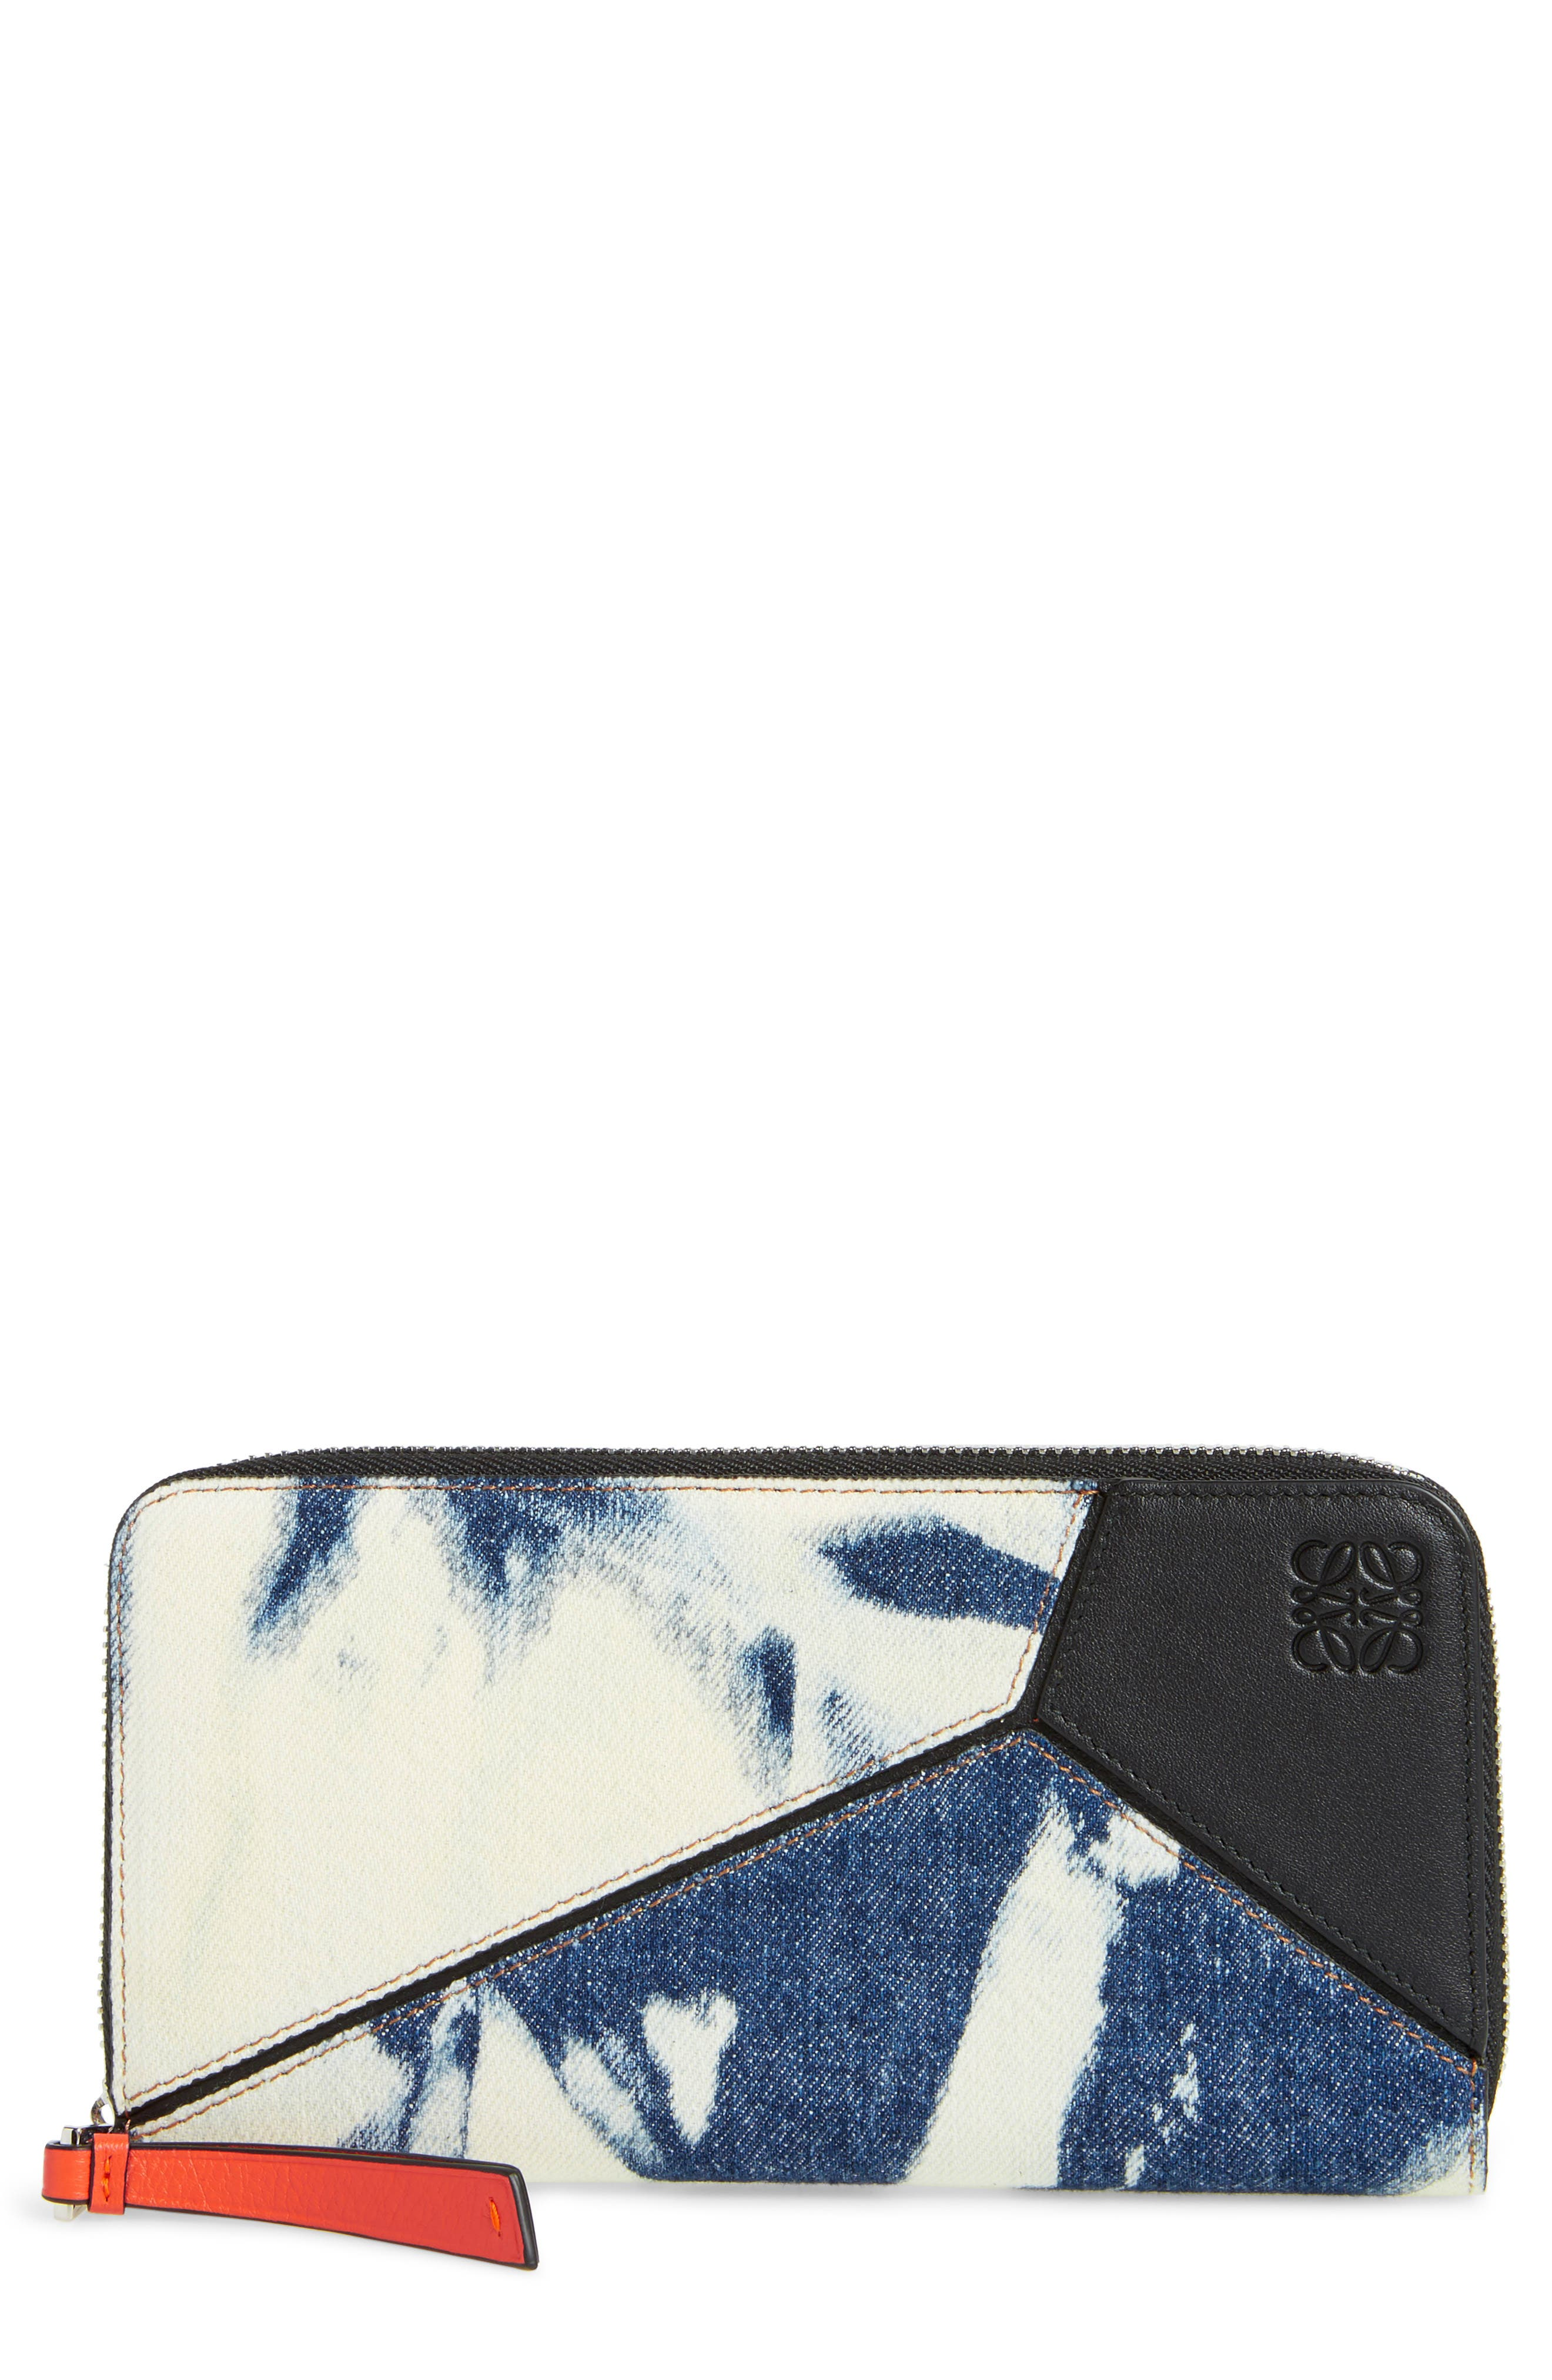 Loewe Denim Puzzle Zip Around Leather Wallet